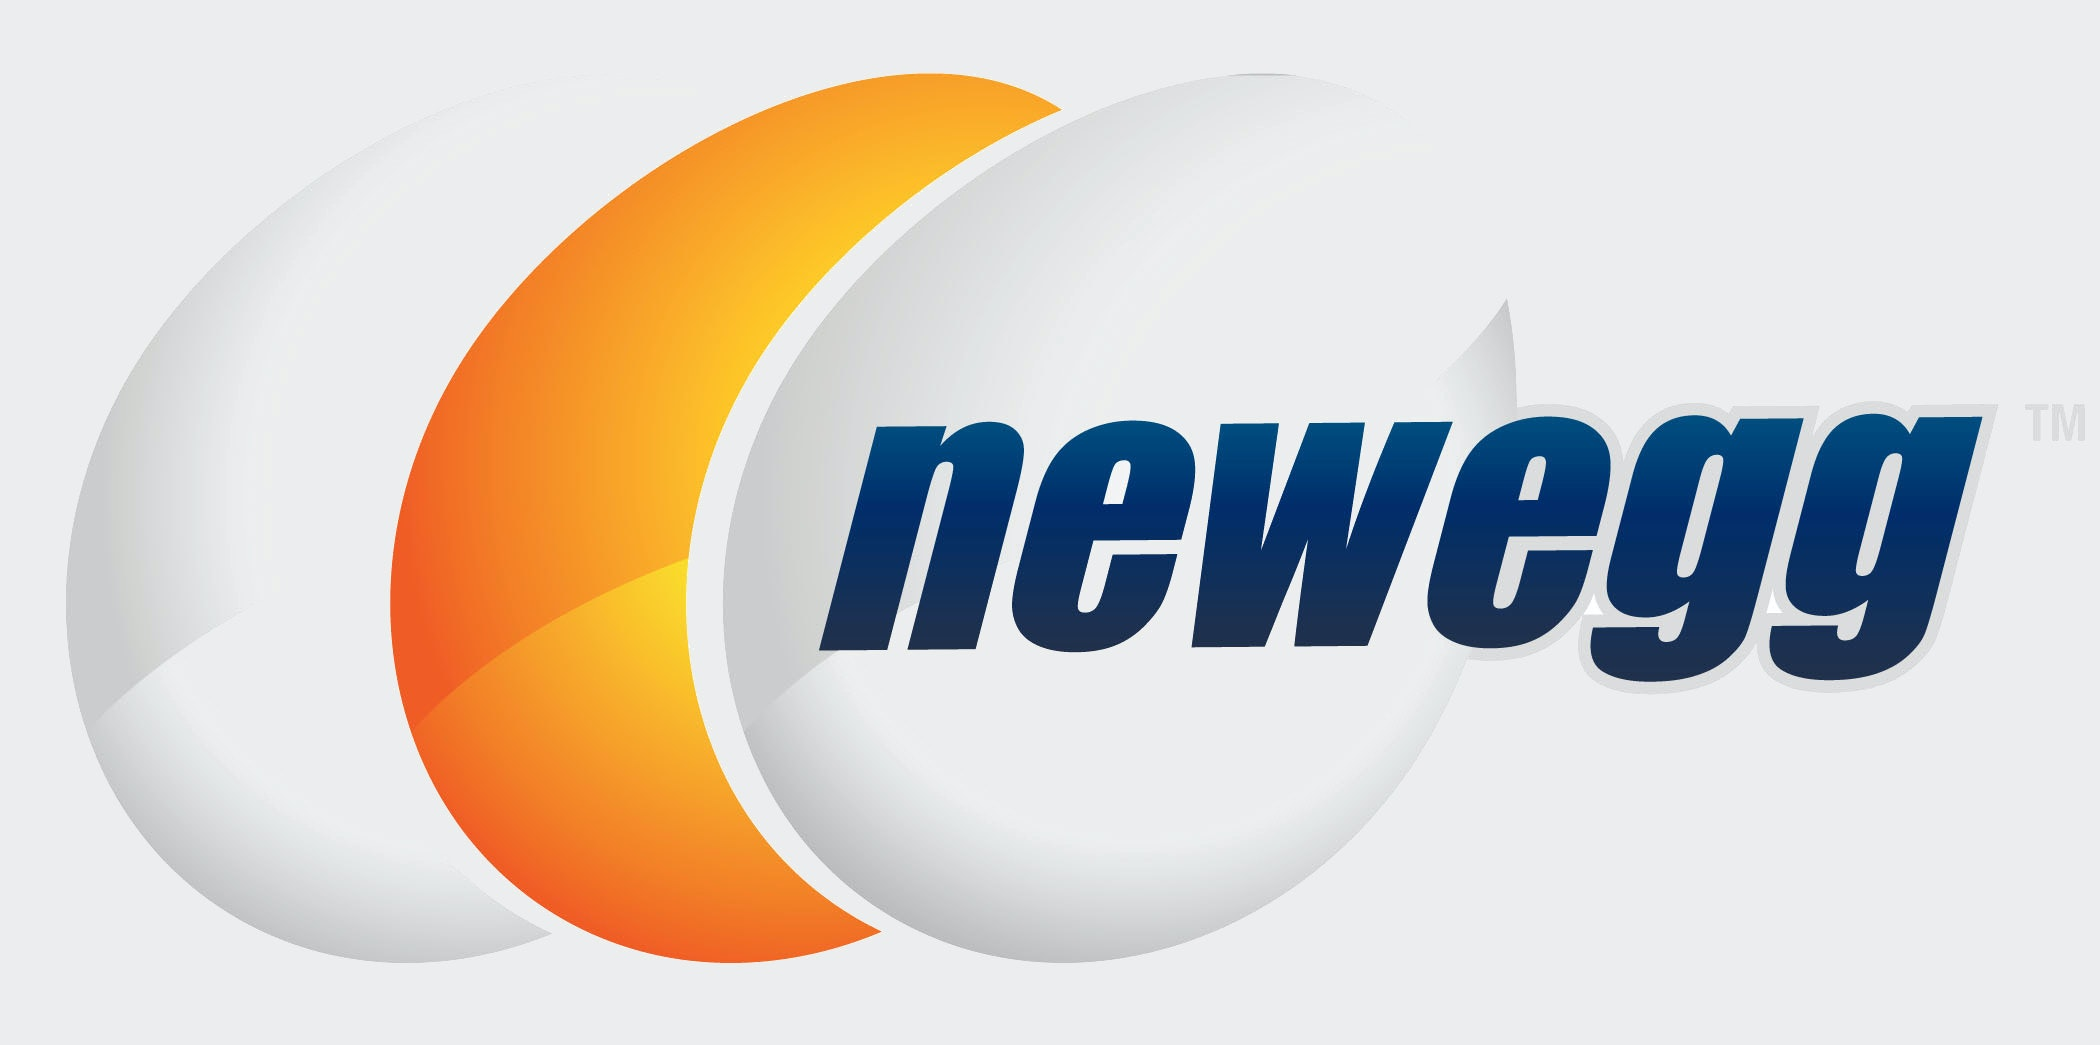 Logo, Newegg, Graphics Cards & Video Adapters, , Font, Brand, Desktop Wallpaper, Portable Network Graphics, , Product, new egg, text, product, orange, logo, font, brand, graphics, graphic design, computer wallpaper, circle, Newegg